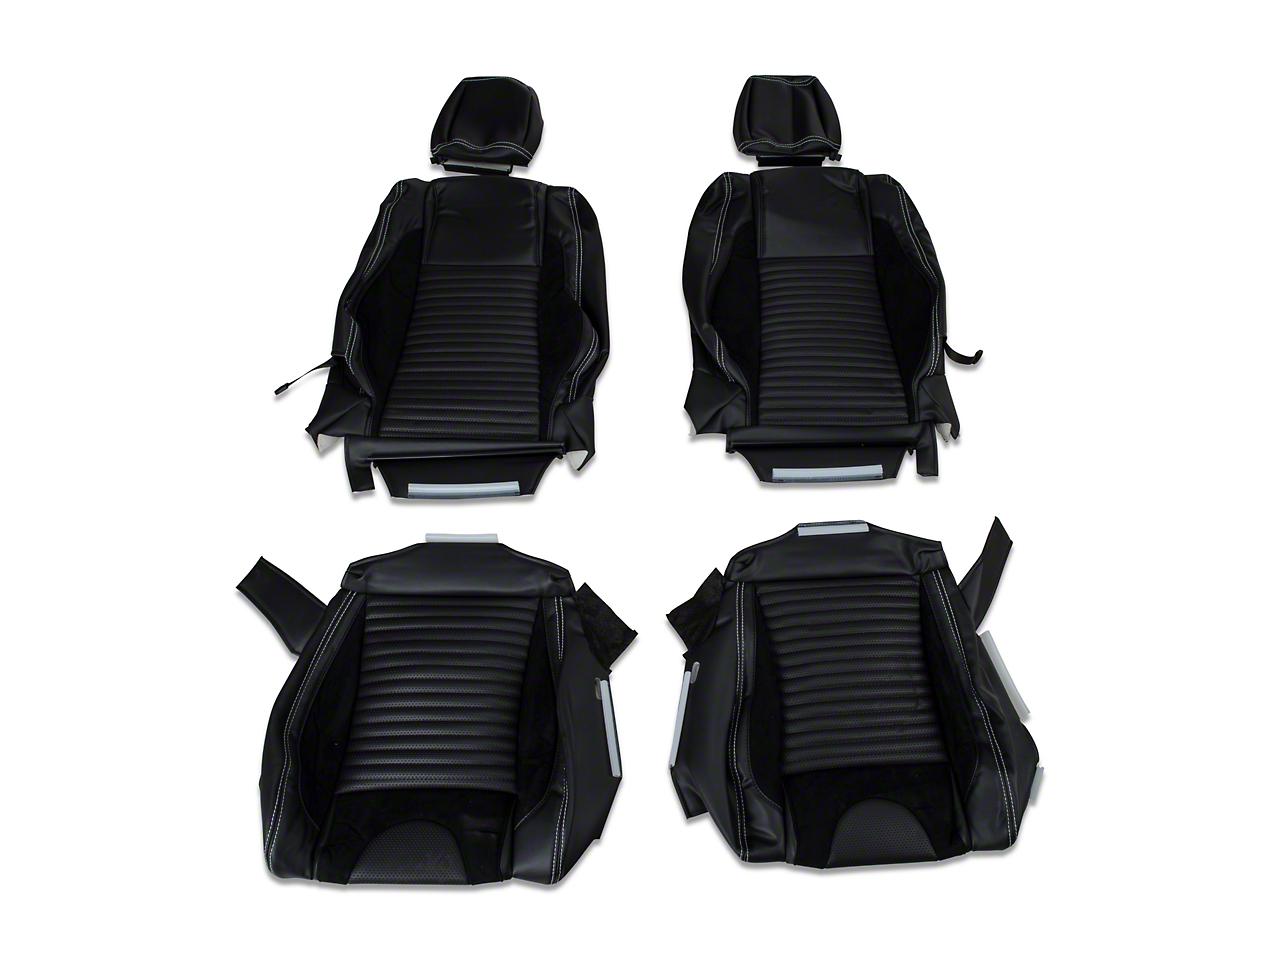 TMI Sport R Vinyl Upholstery Full Set - White Stitch (05-07 Coupe Non-Airbag)